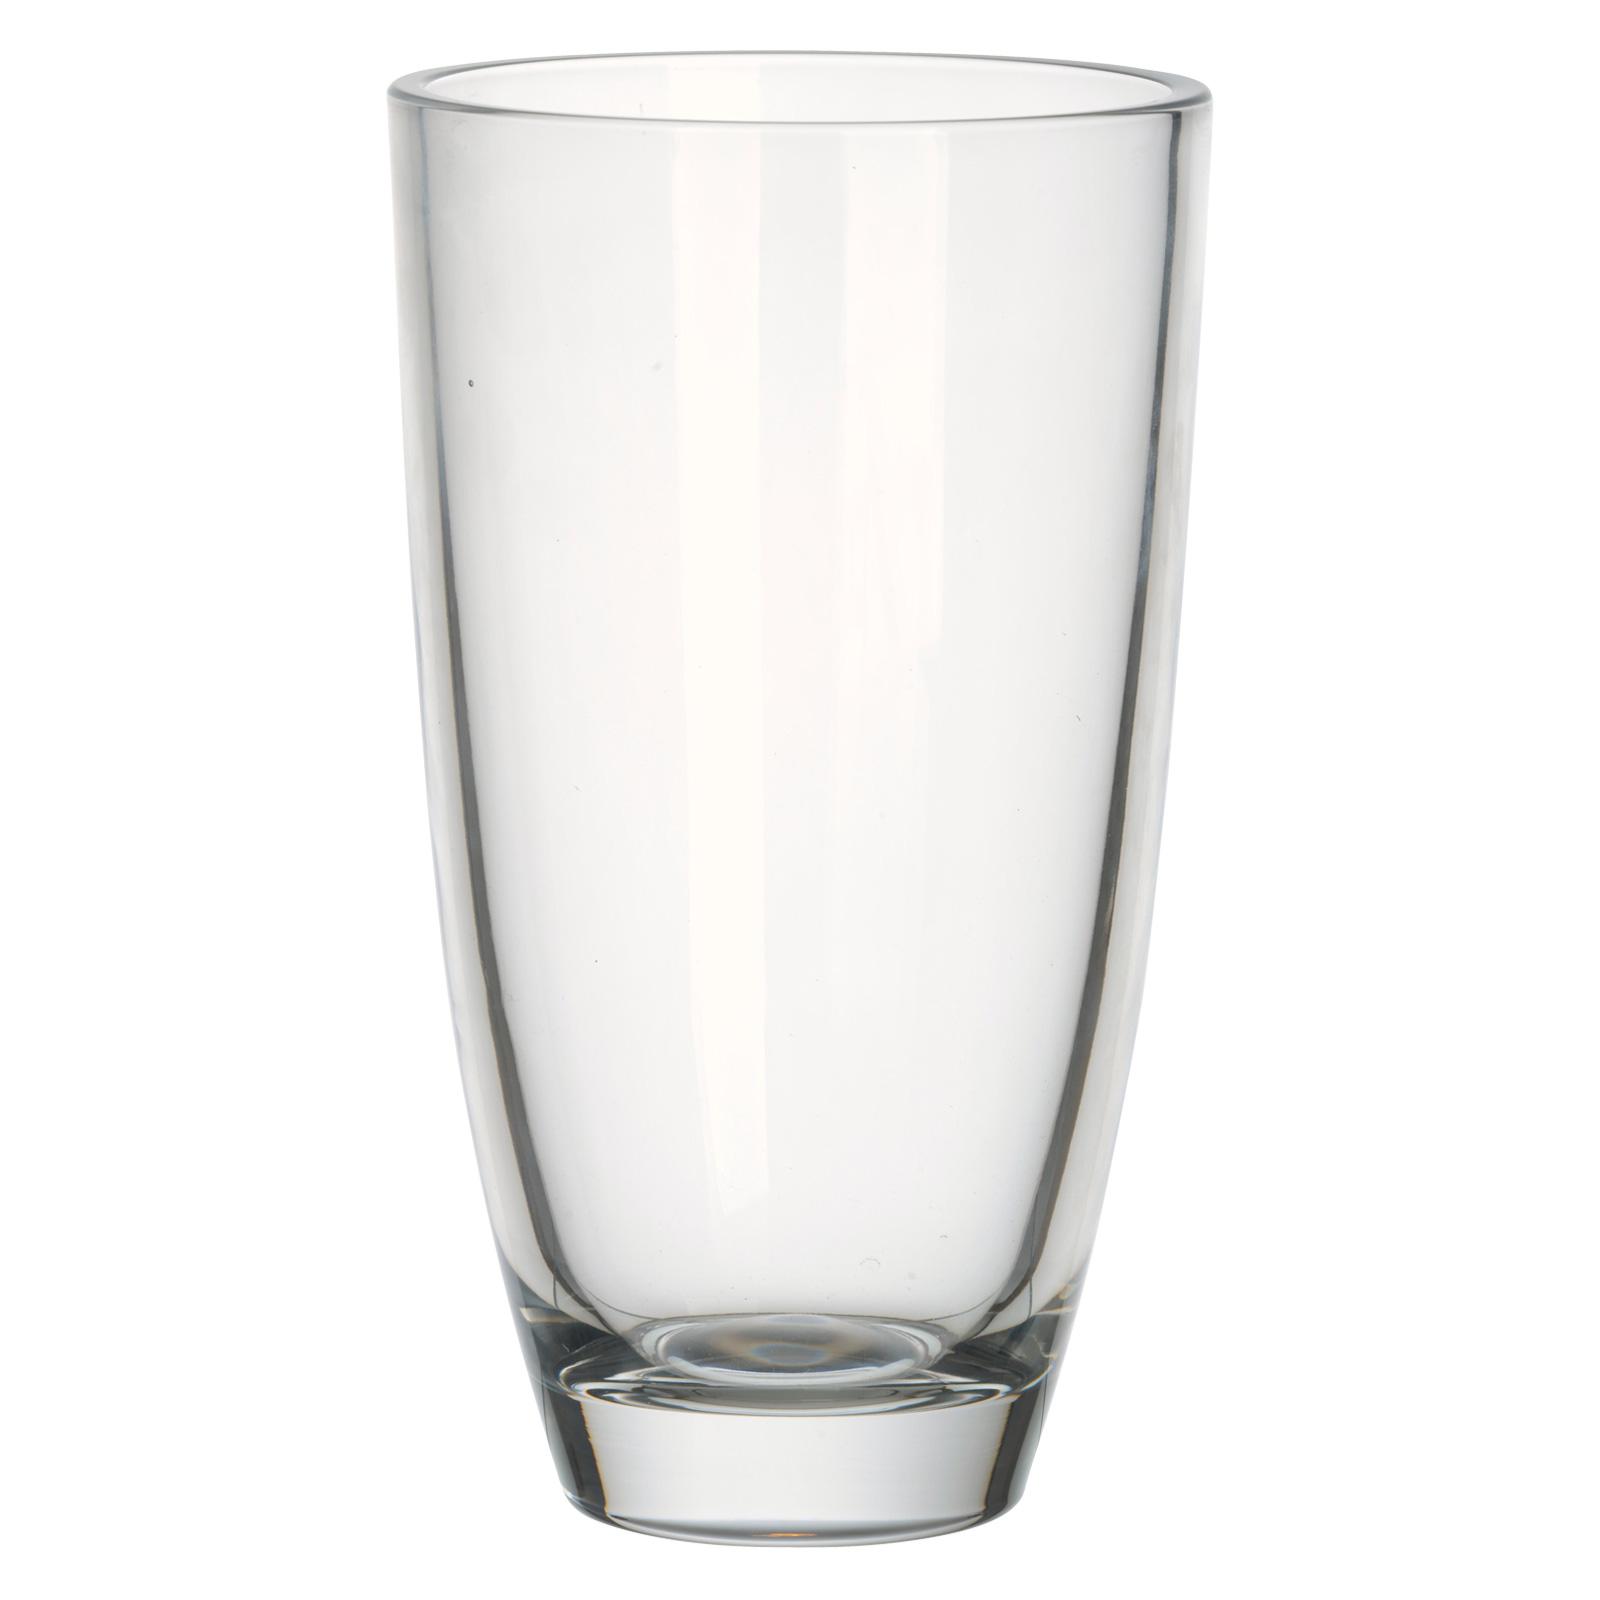 Plain Vase (24%) by Bohemia